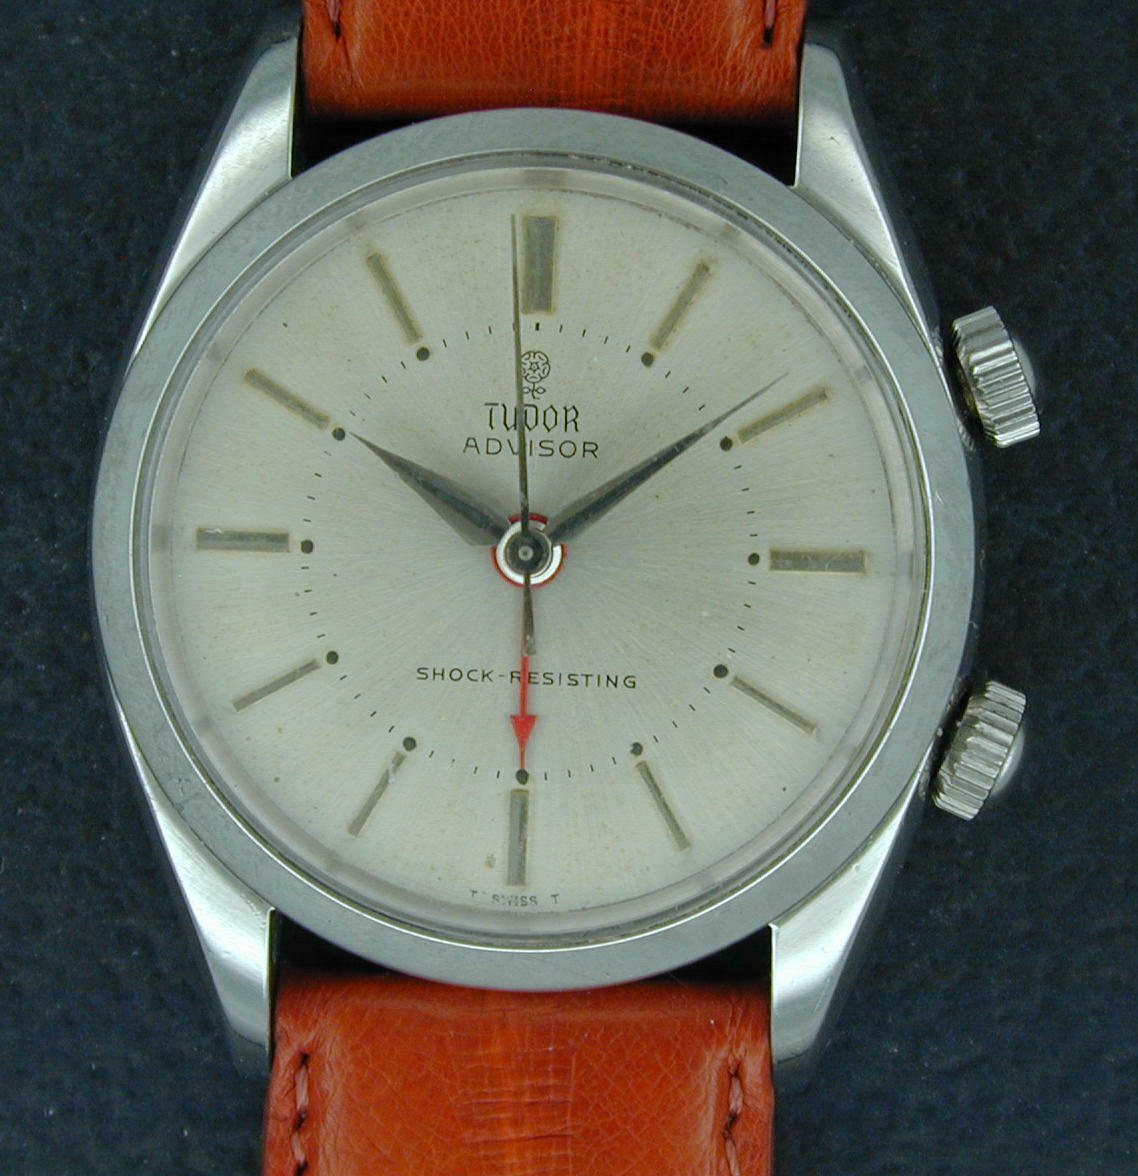 Rolex Tudor Advisor Alarm #171234